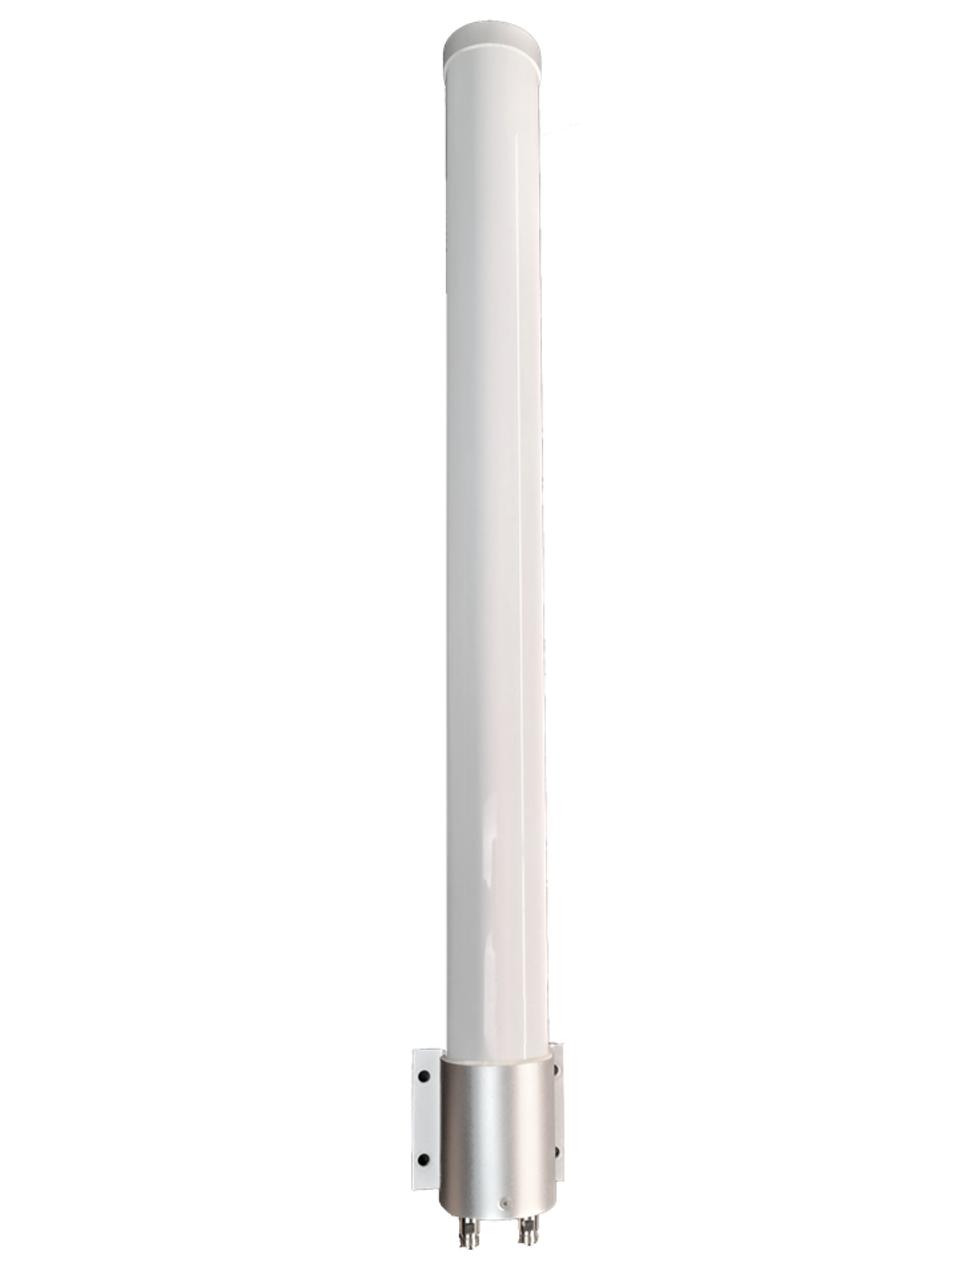 M39 MIMO 2 x Cellular 4G LTE CBRS 5G NR M2M IoT Bracket Mount Antenna